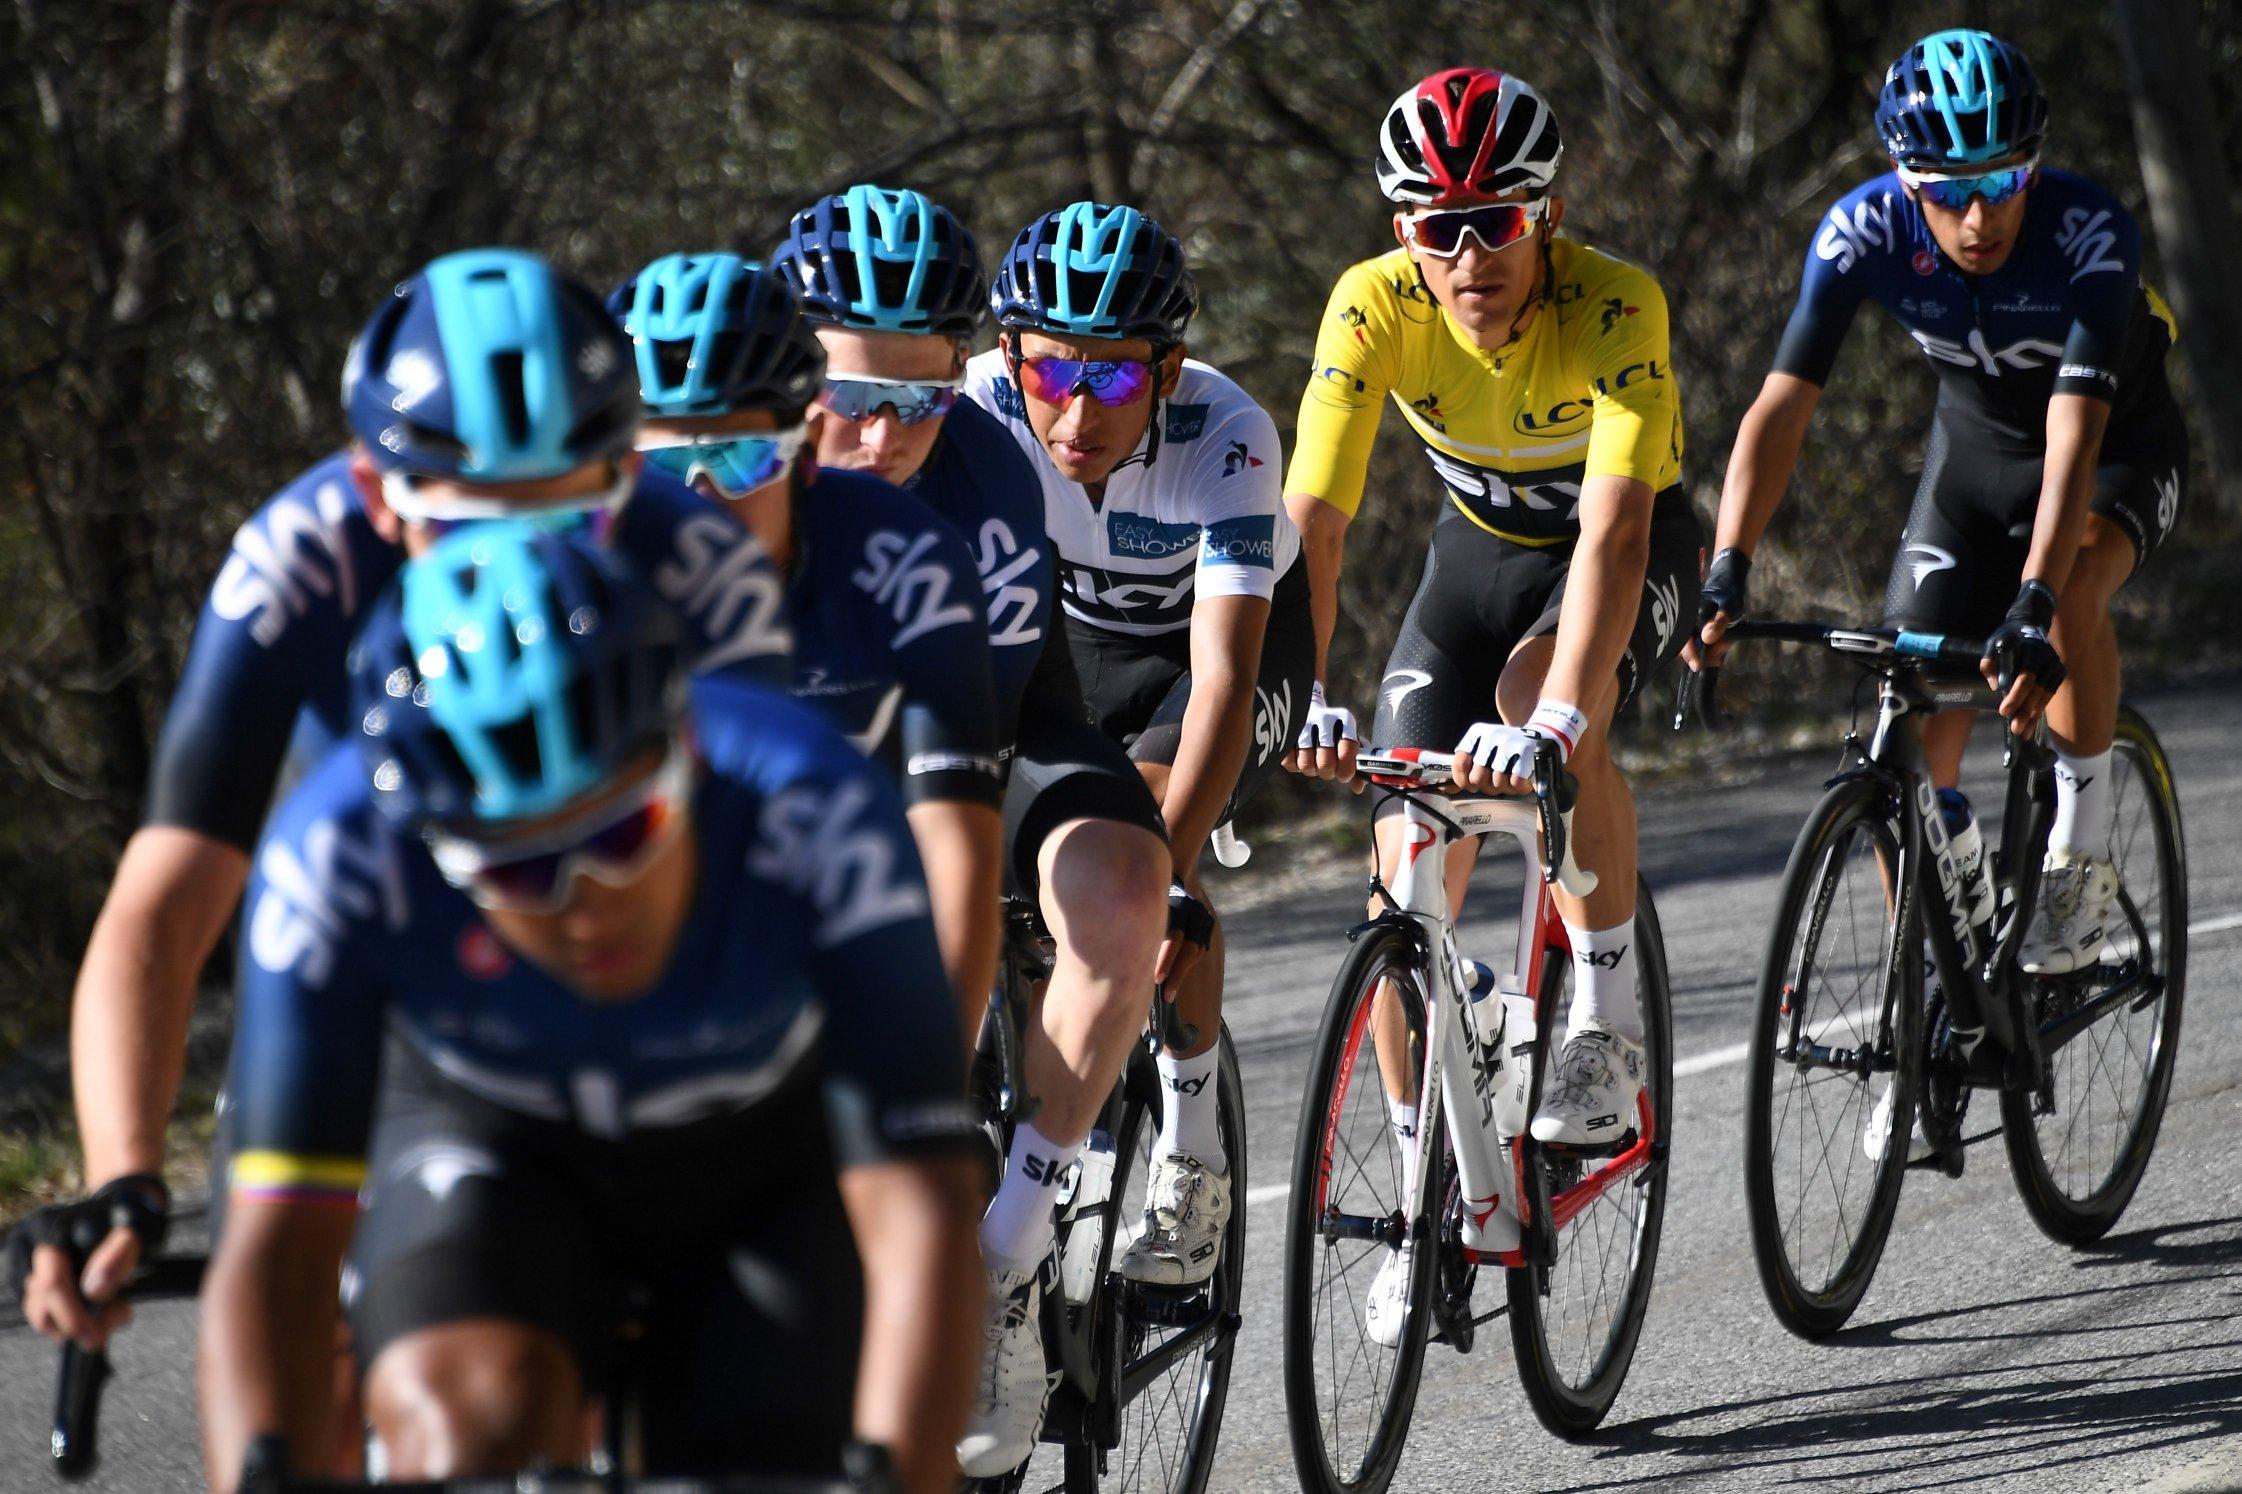 Ciclismo, Team Sky diventa Ineos, Ratcliffe il nuovo proprietario